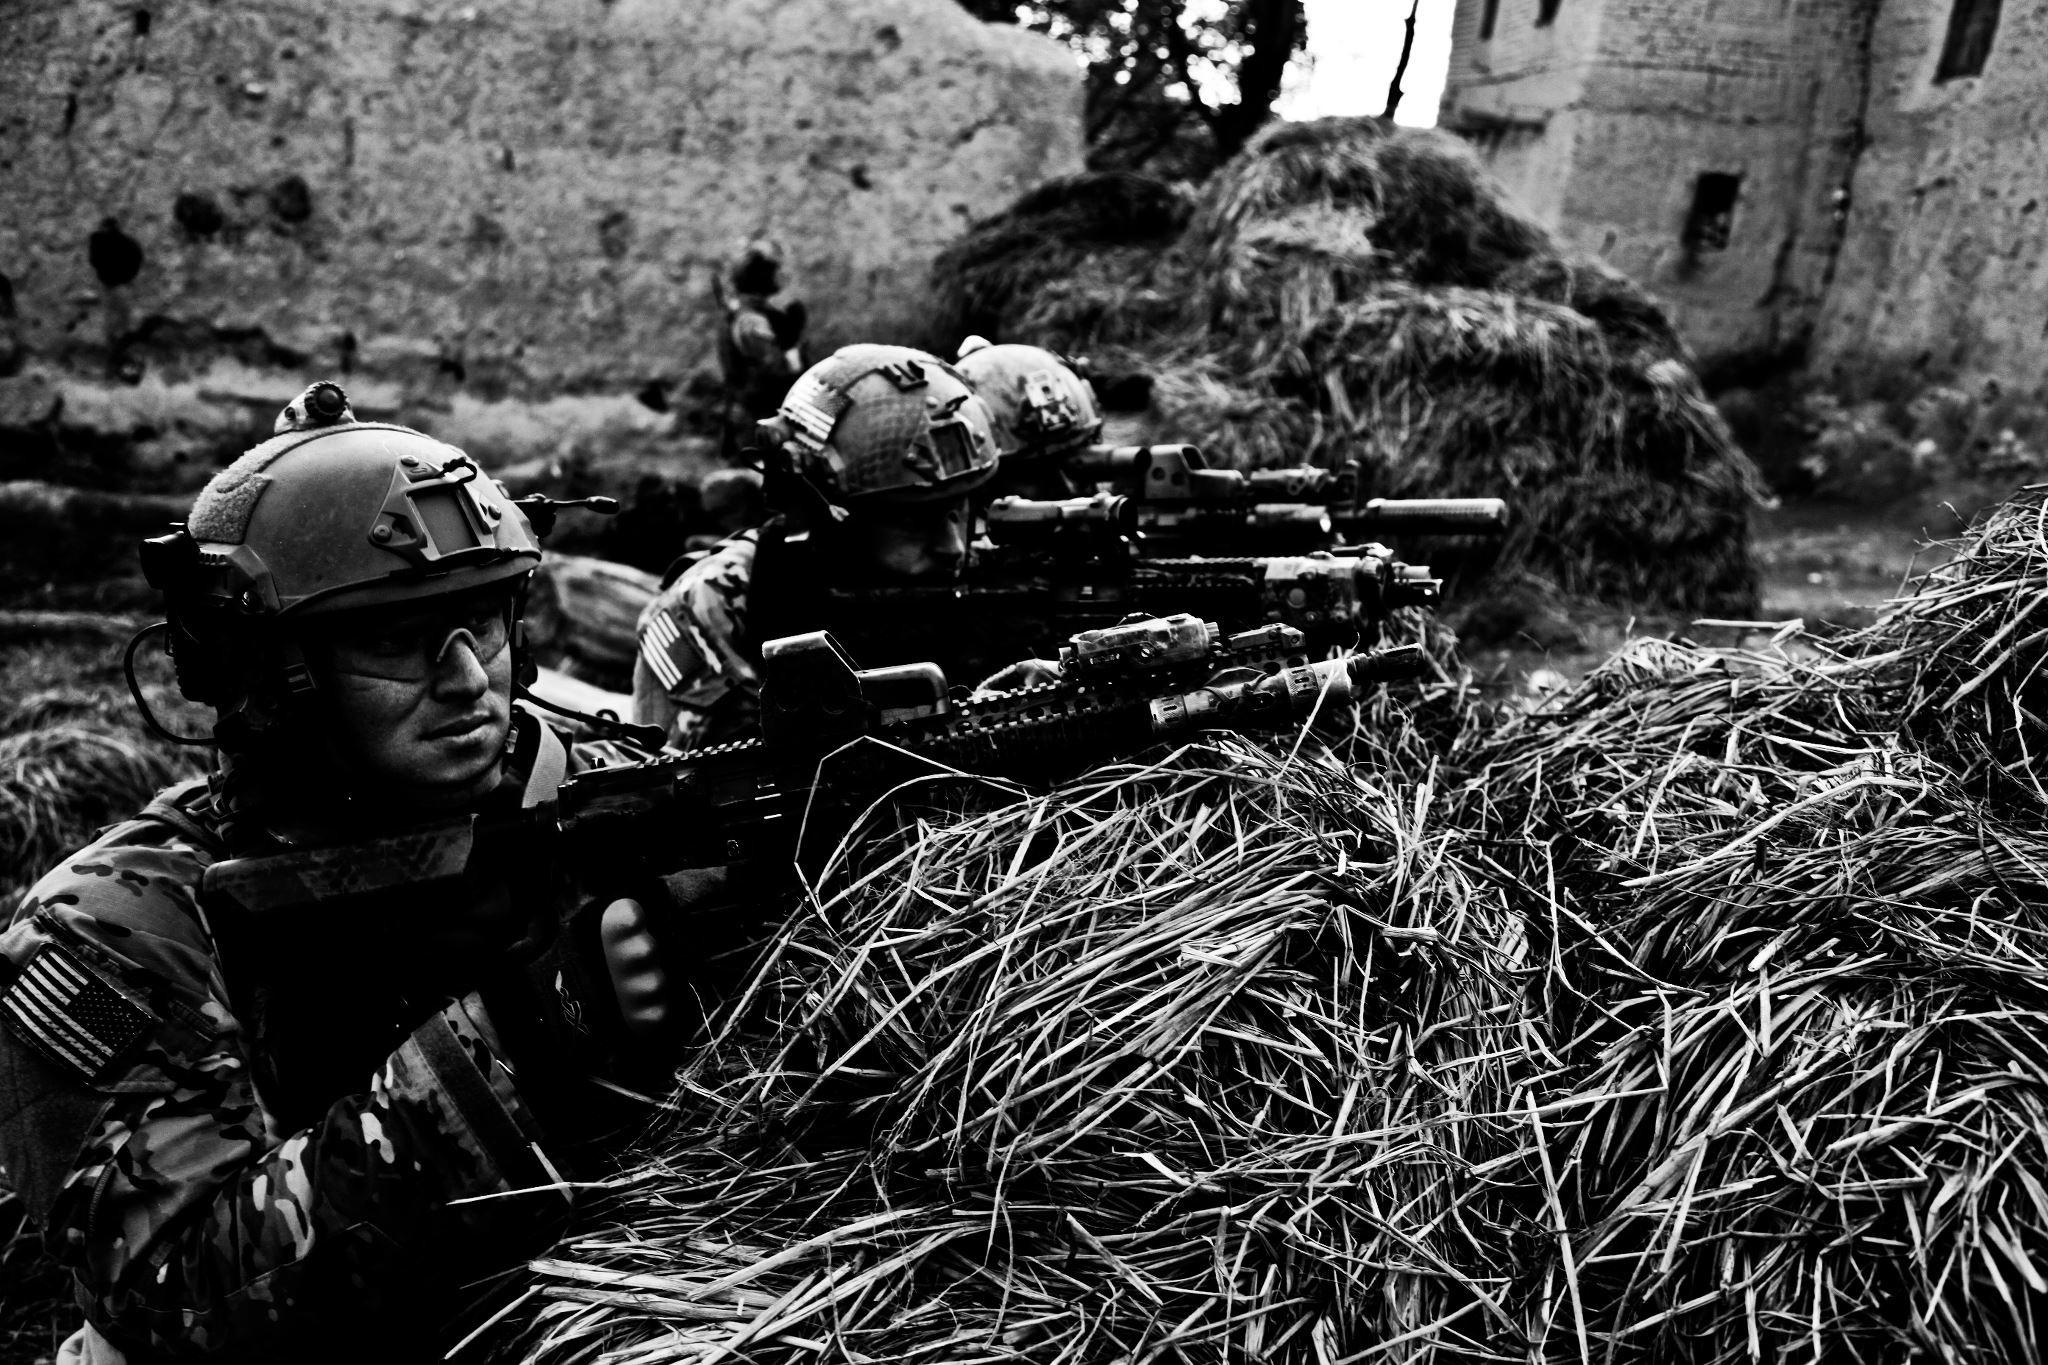 1440x2560 Wallpaper Ranger School Army Usa